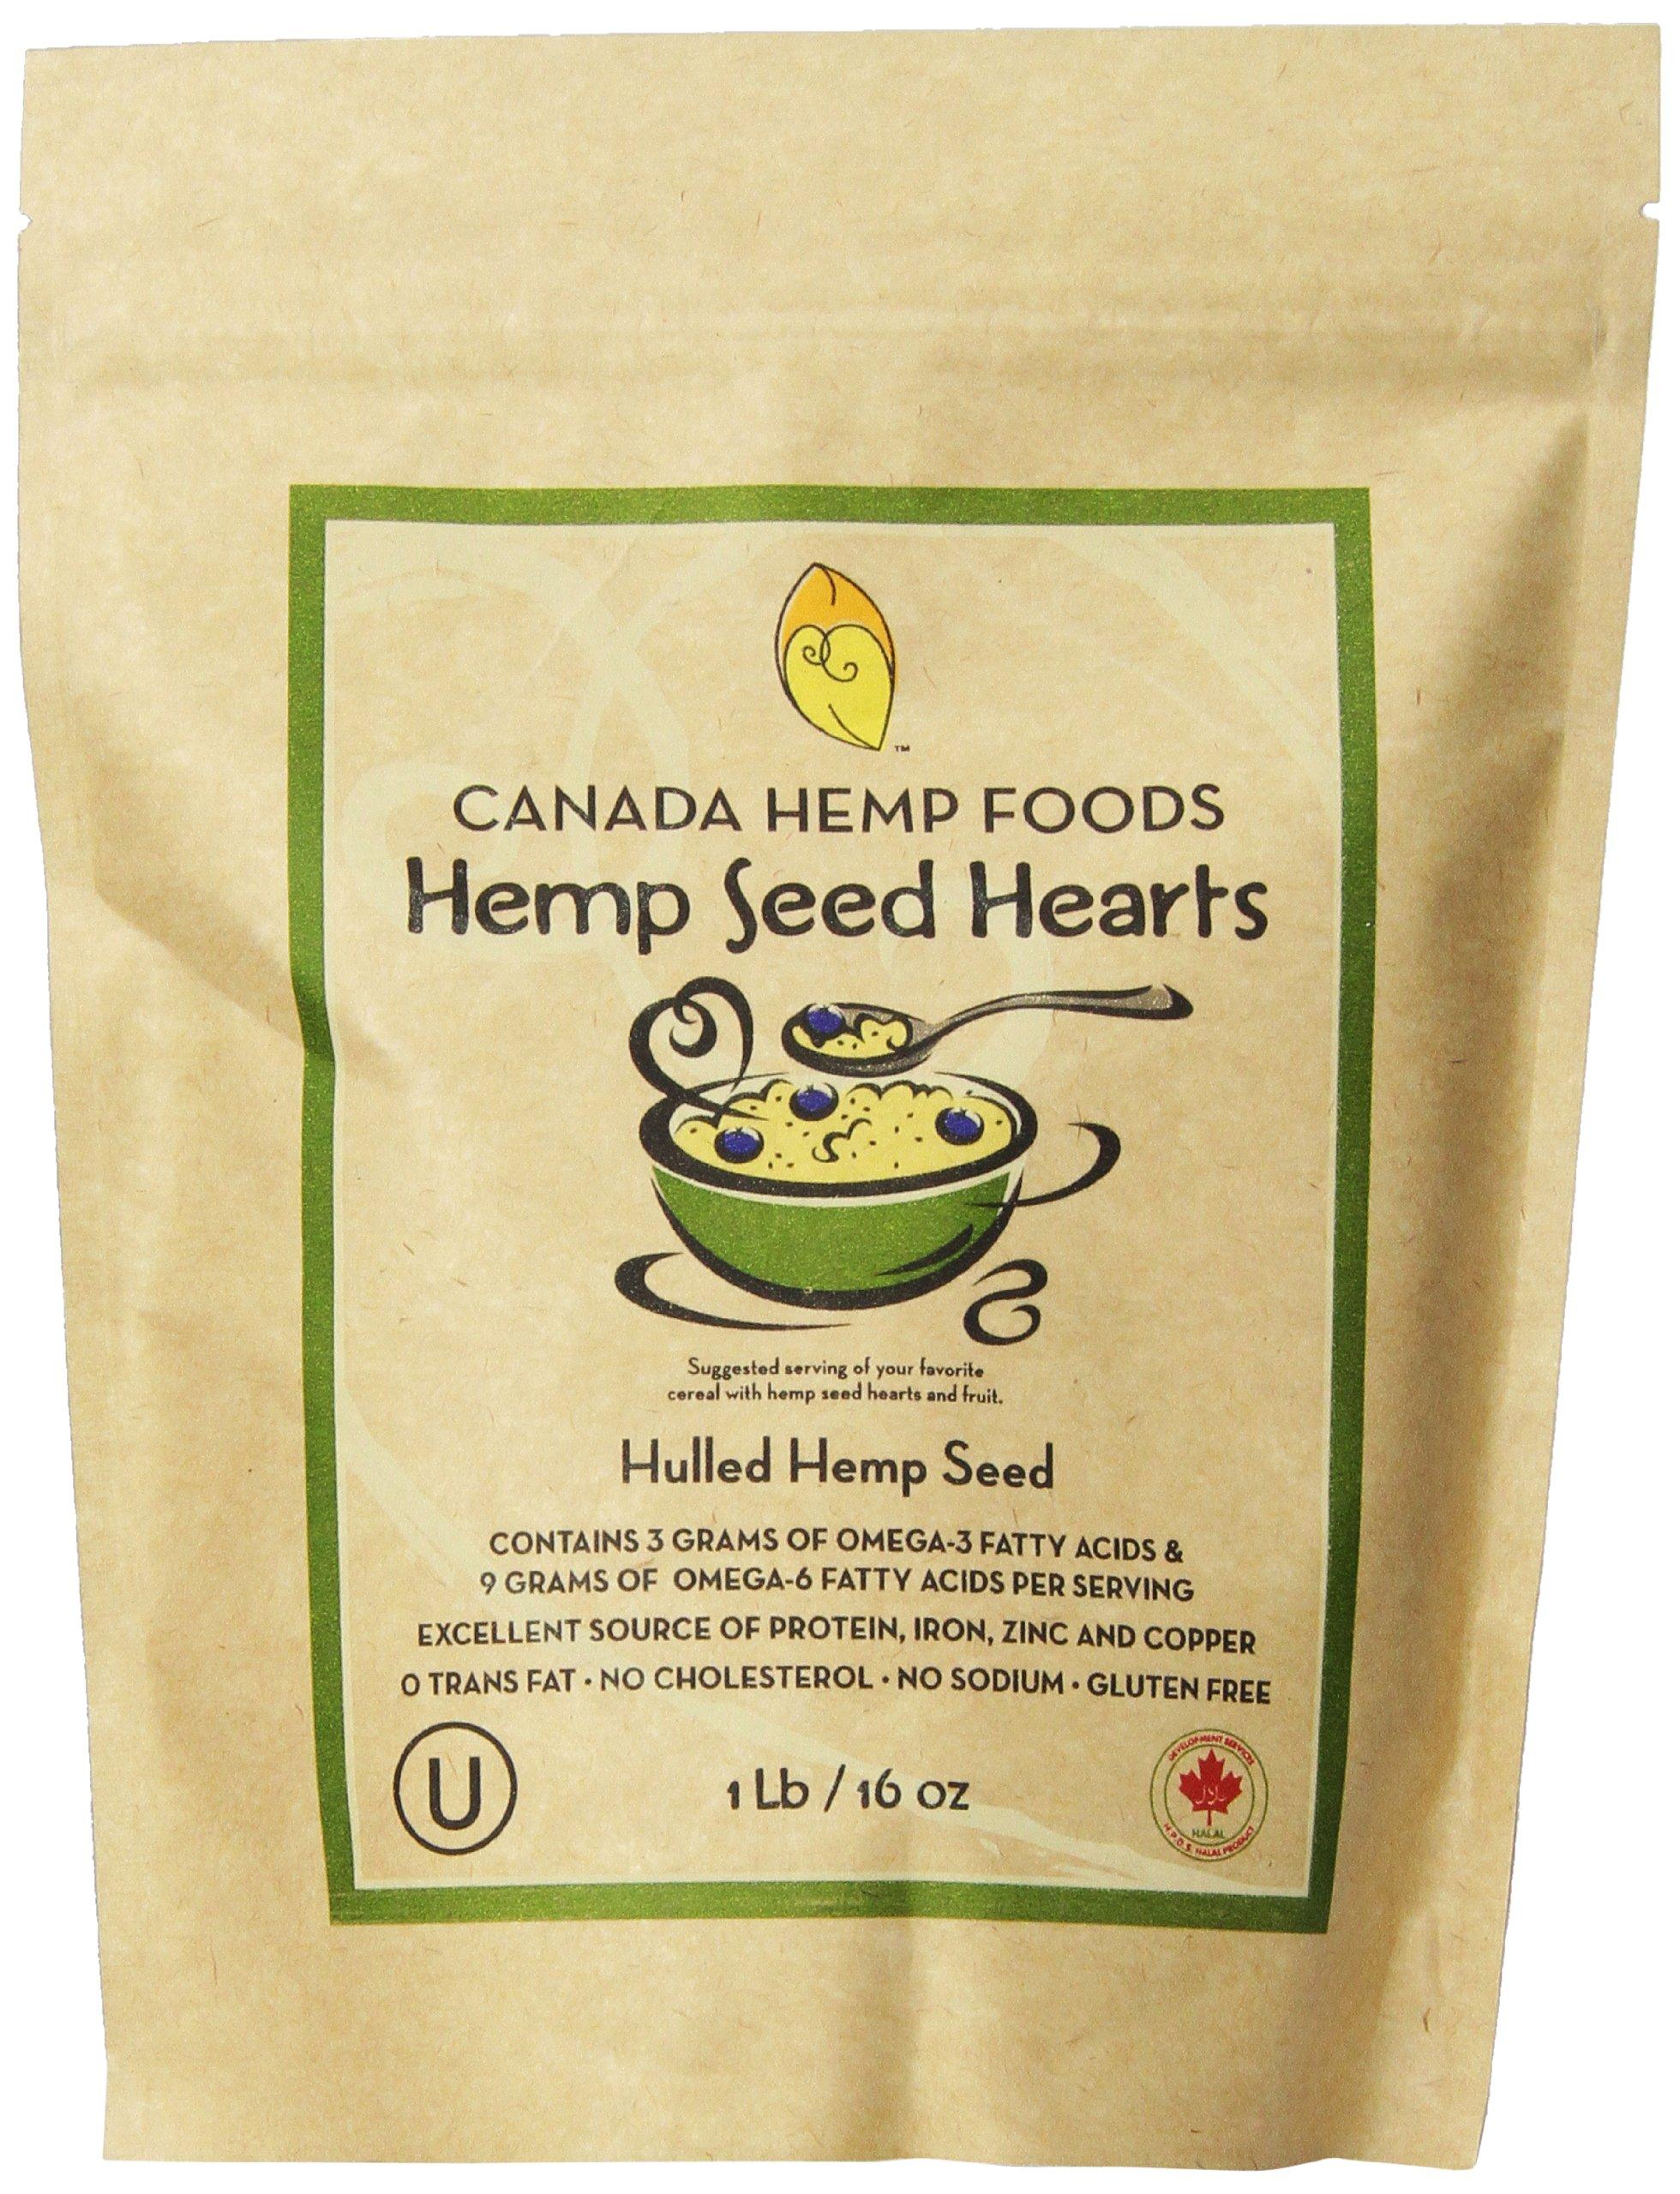 Canada Hemp Foods, Natural Hemp Seed Hearts, 16 ounce pouch